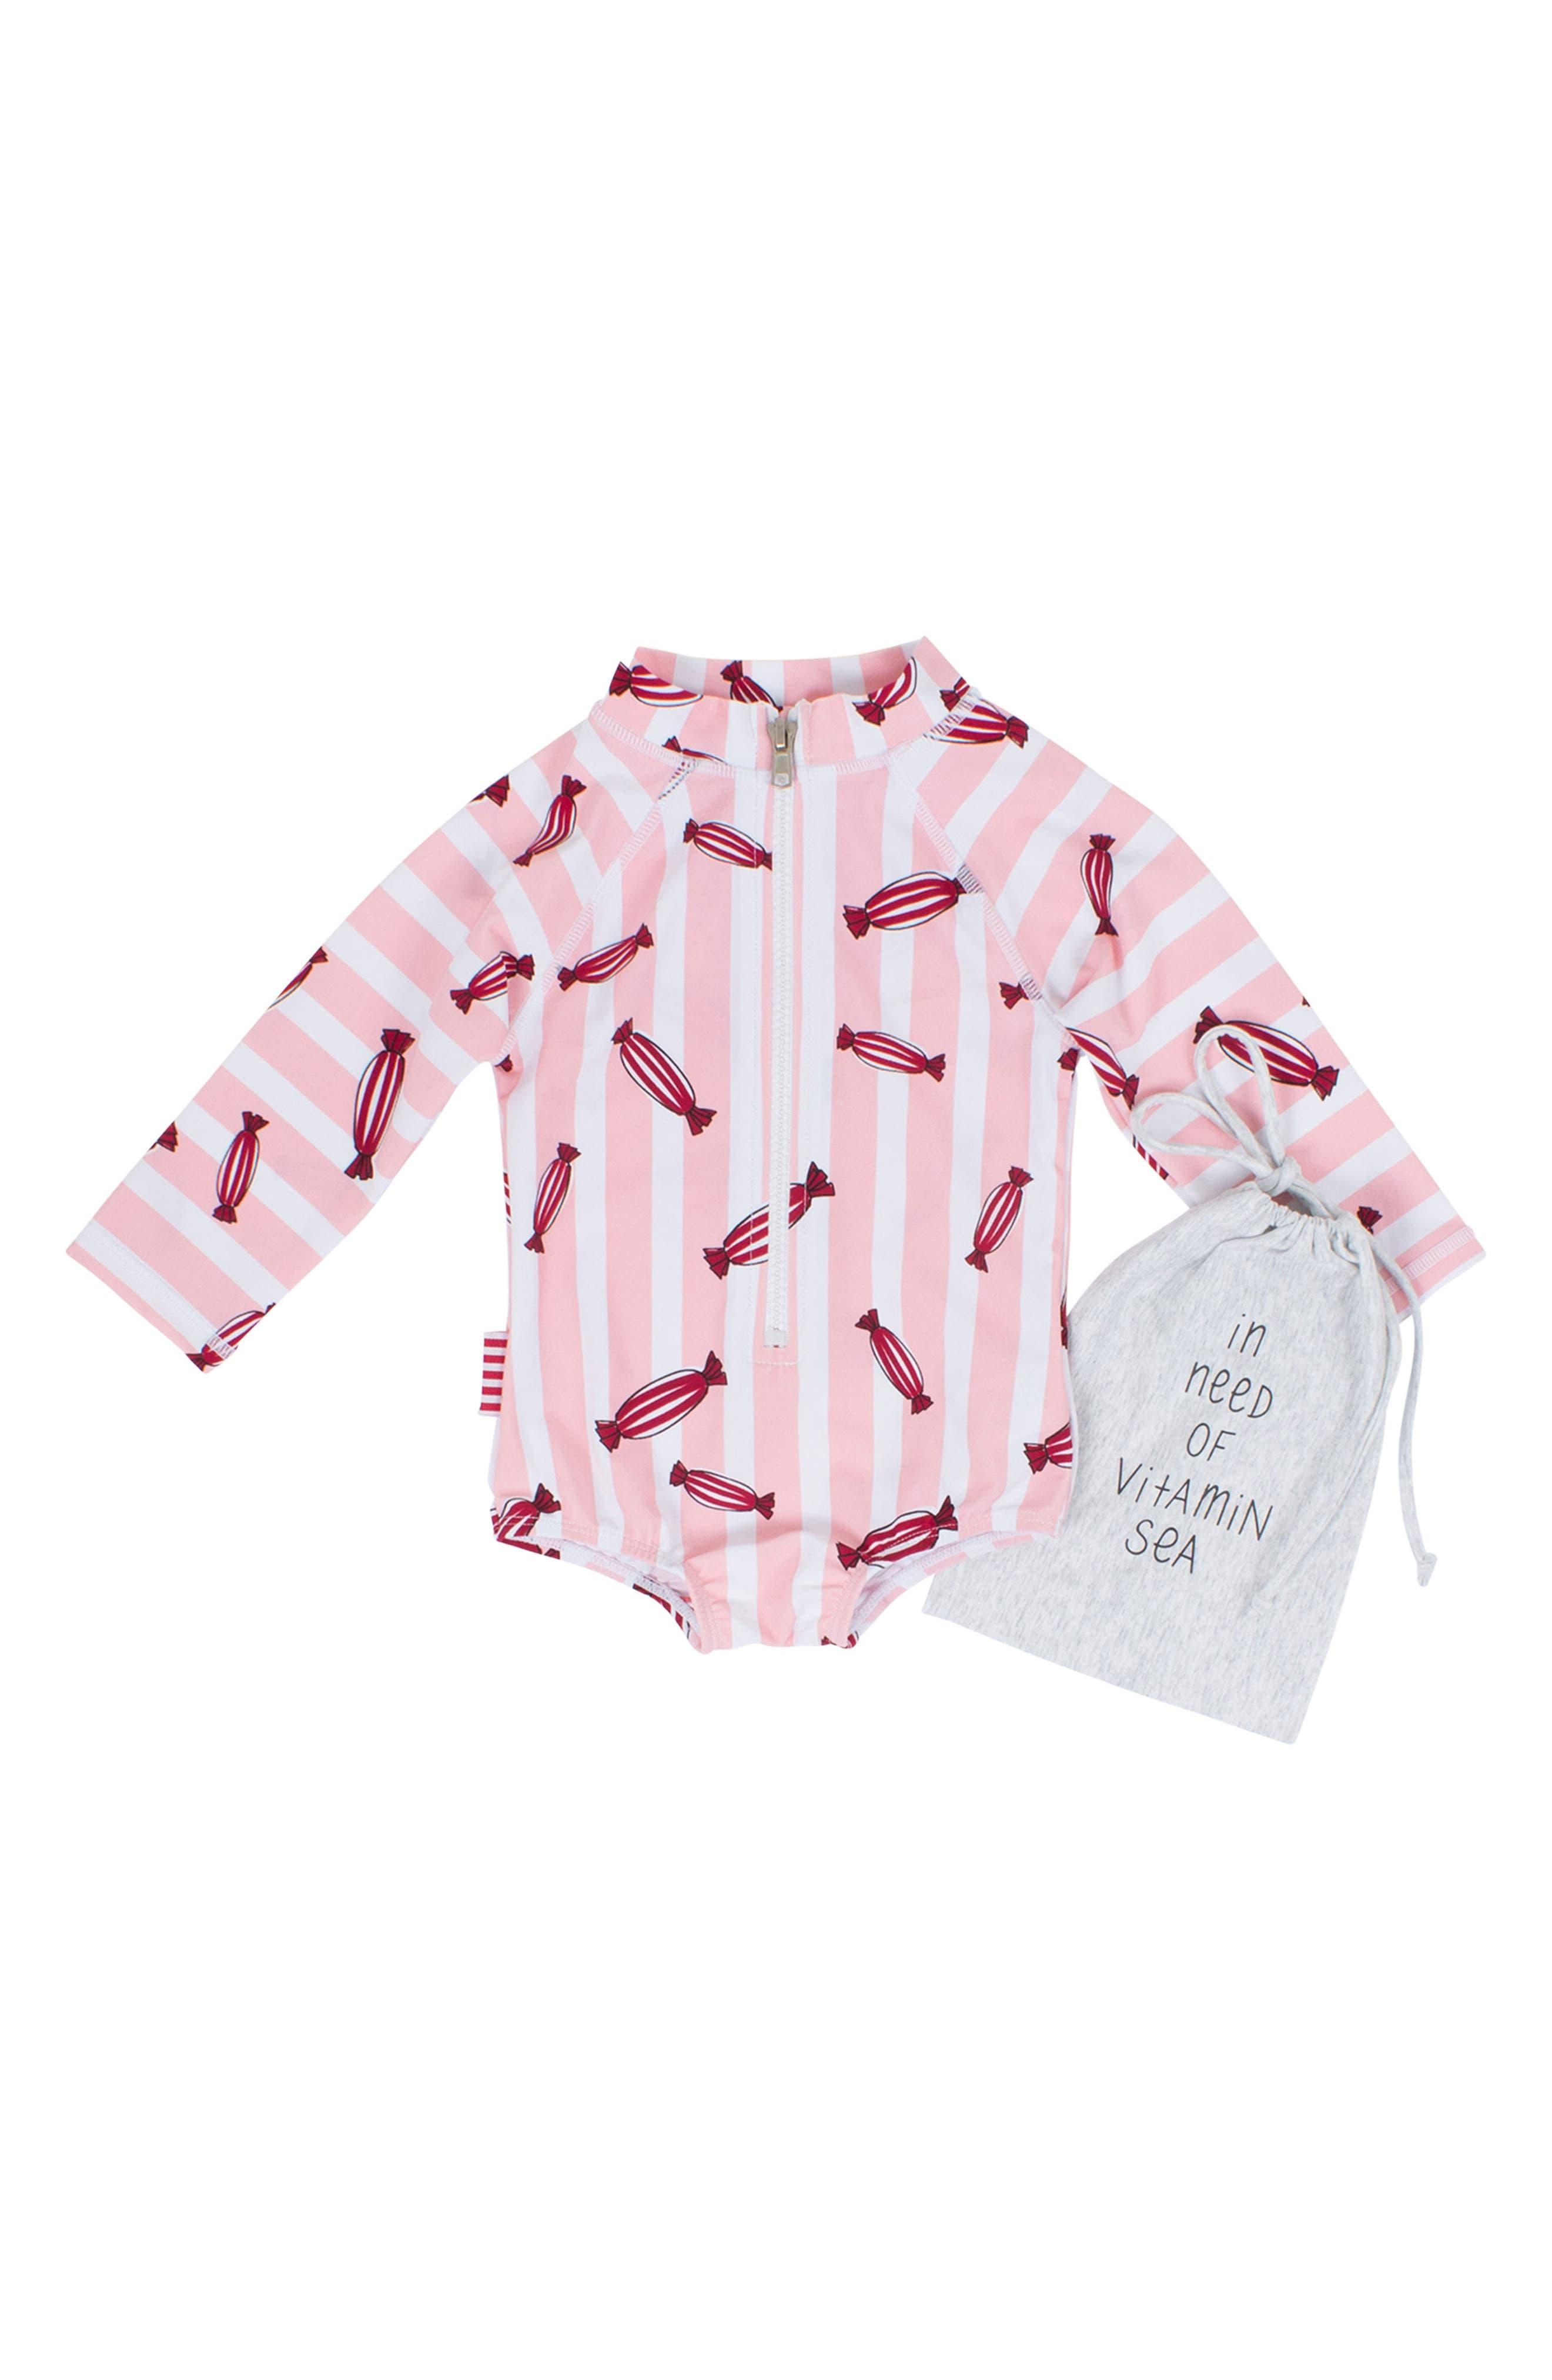 Bonbon One-Piece Rashguard Swimsuit,                         Main,                         color,